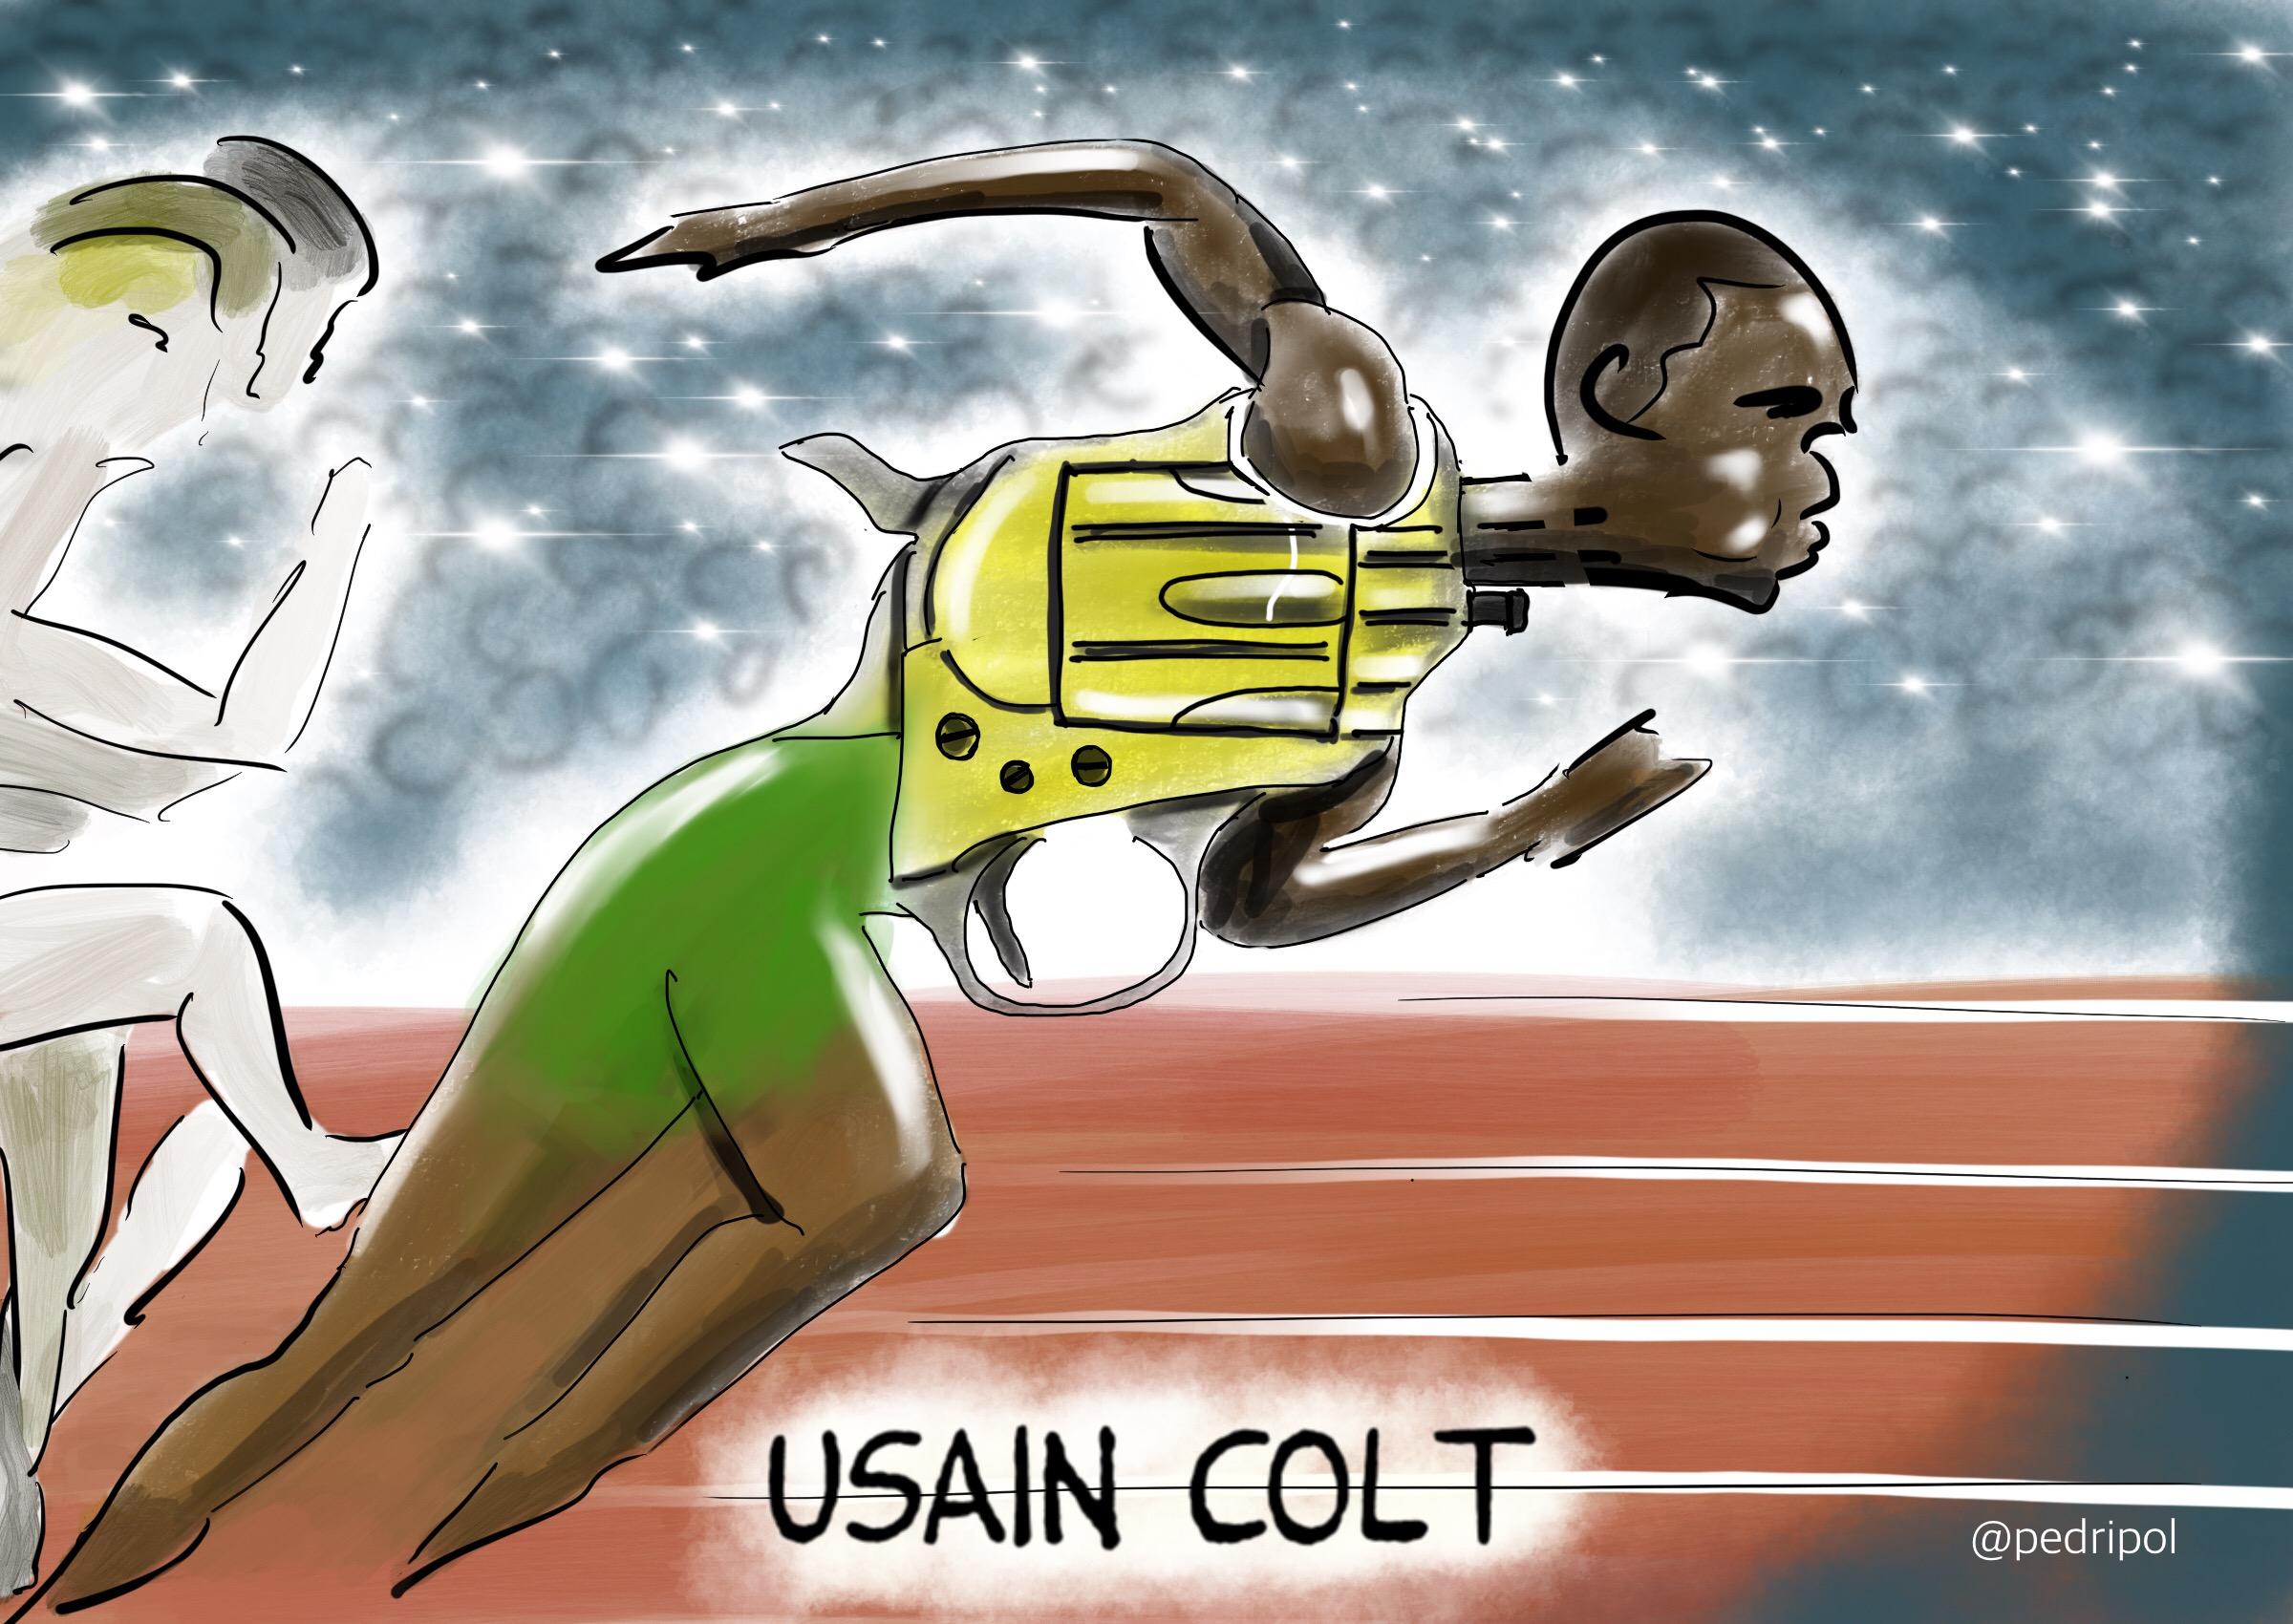 Usain Colt